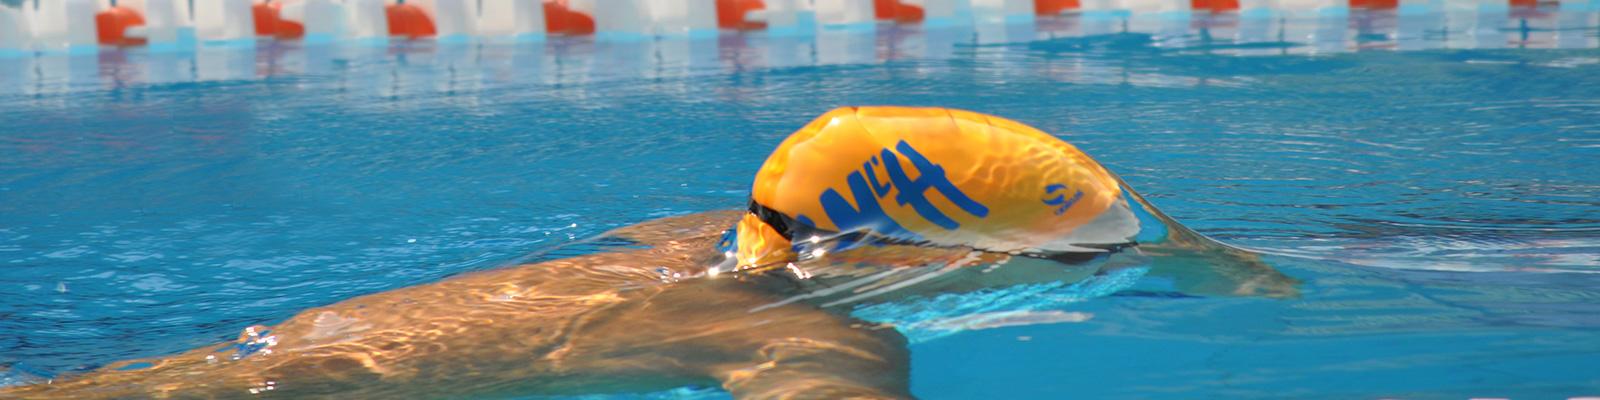 cnlh portada natacio